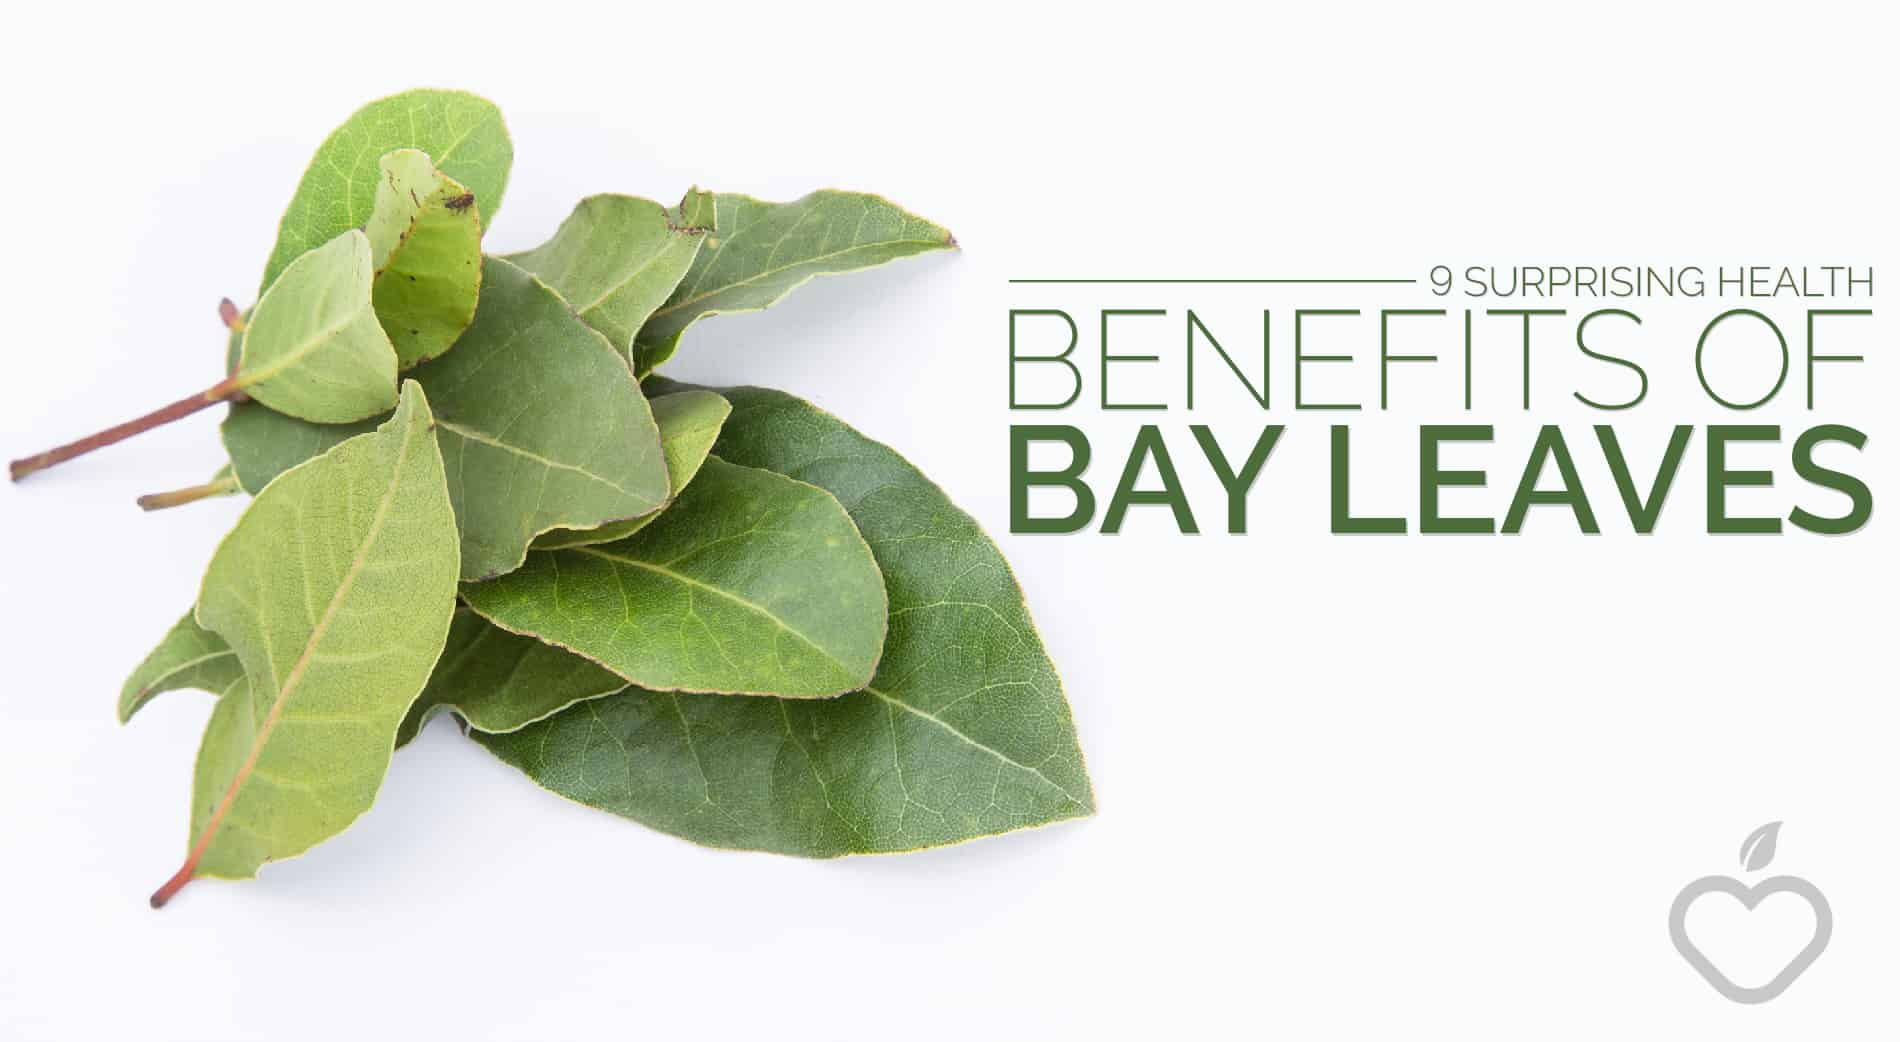 Bay Leaves Image Design 1 - 9 Surprising Health Benefits Of Bay Leaves